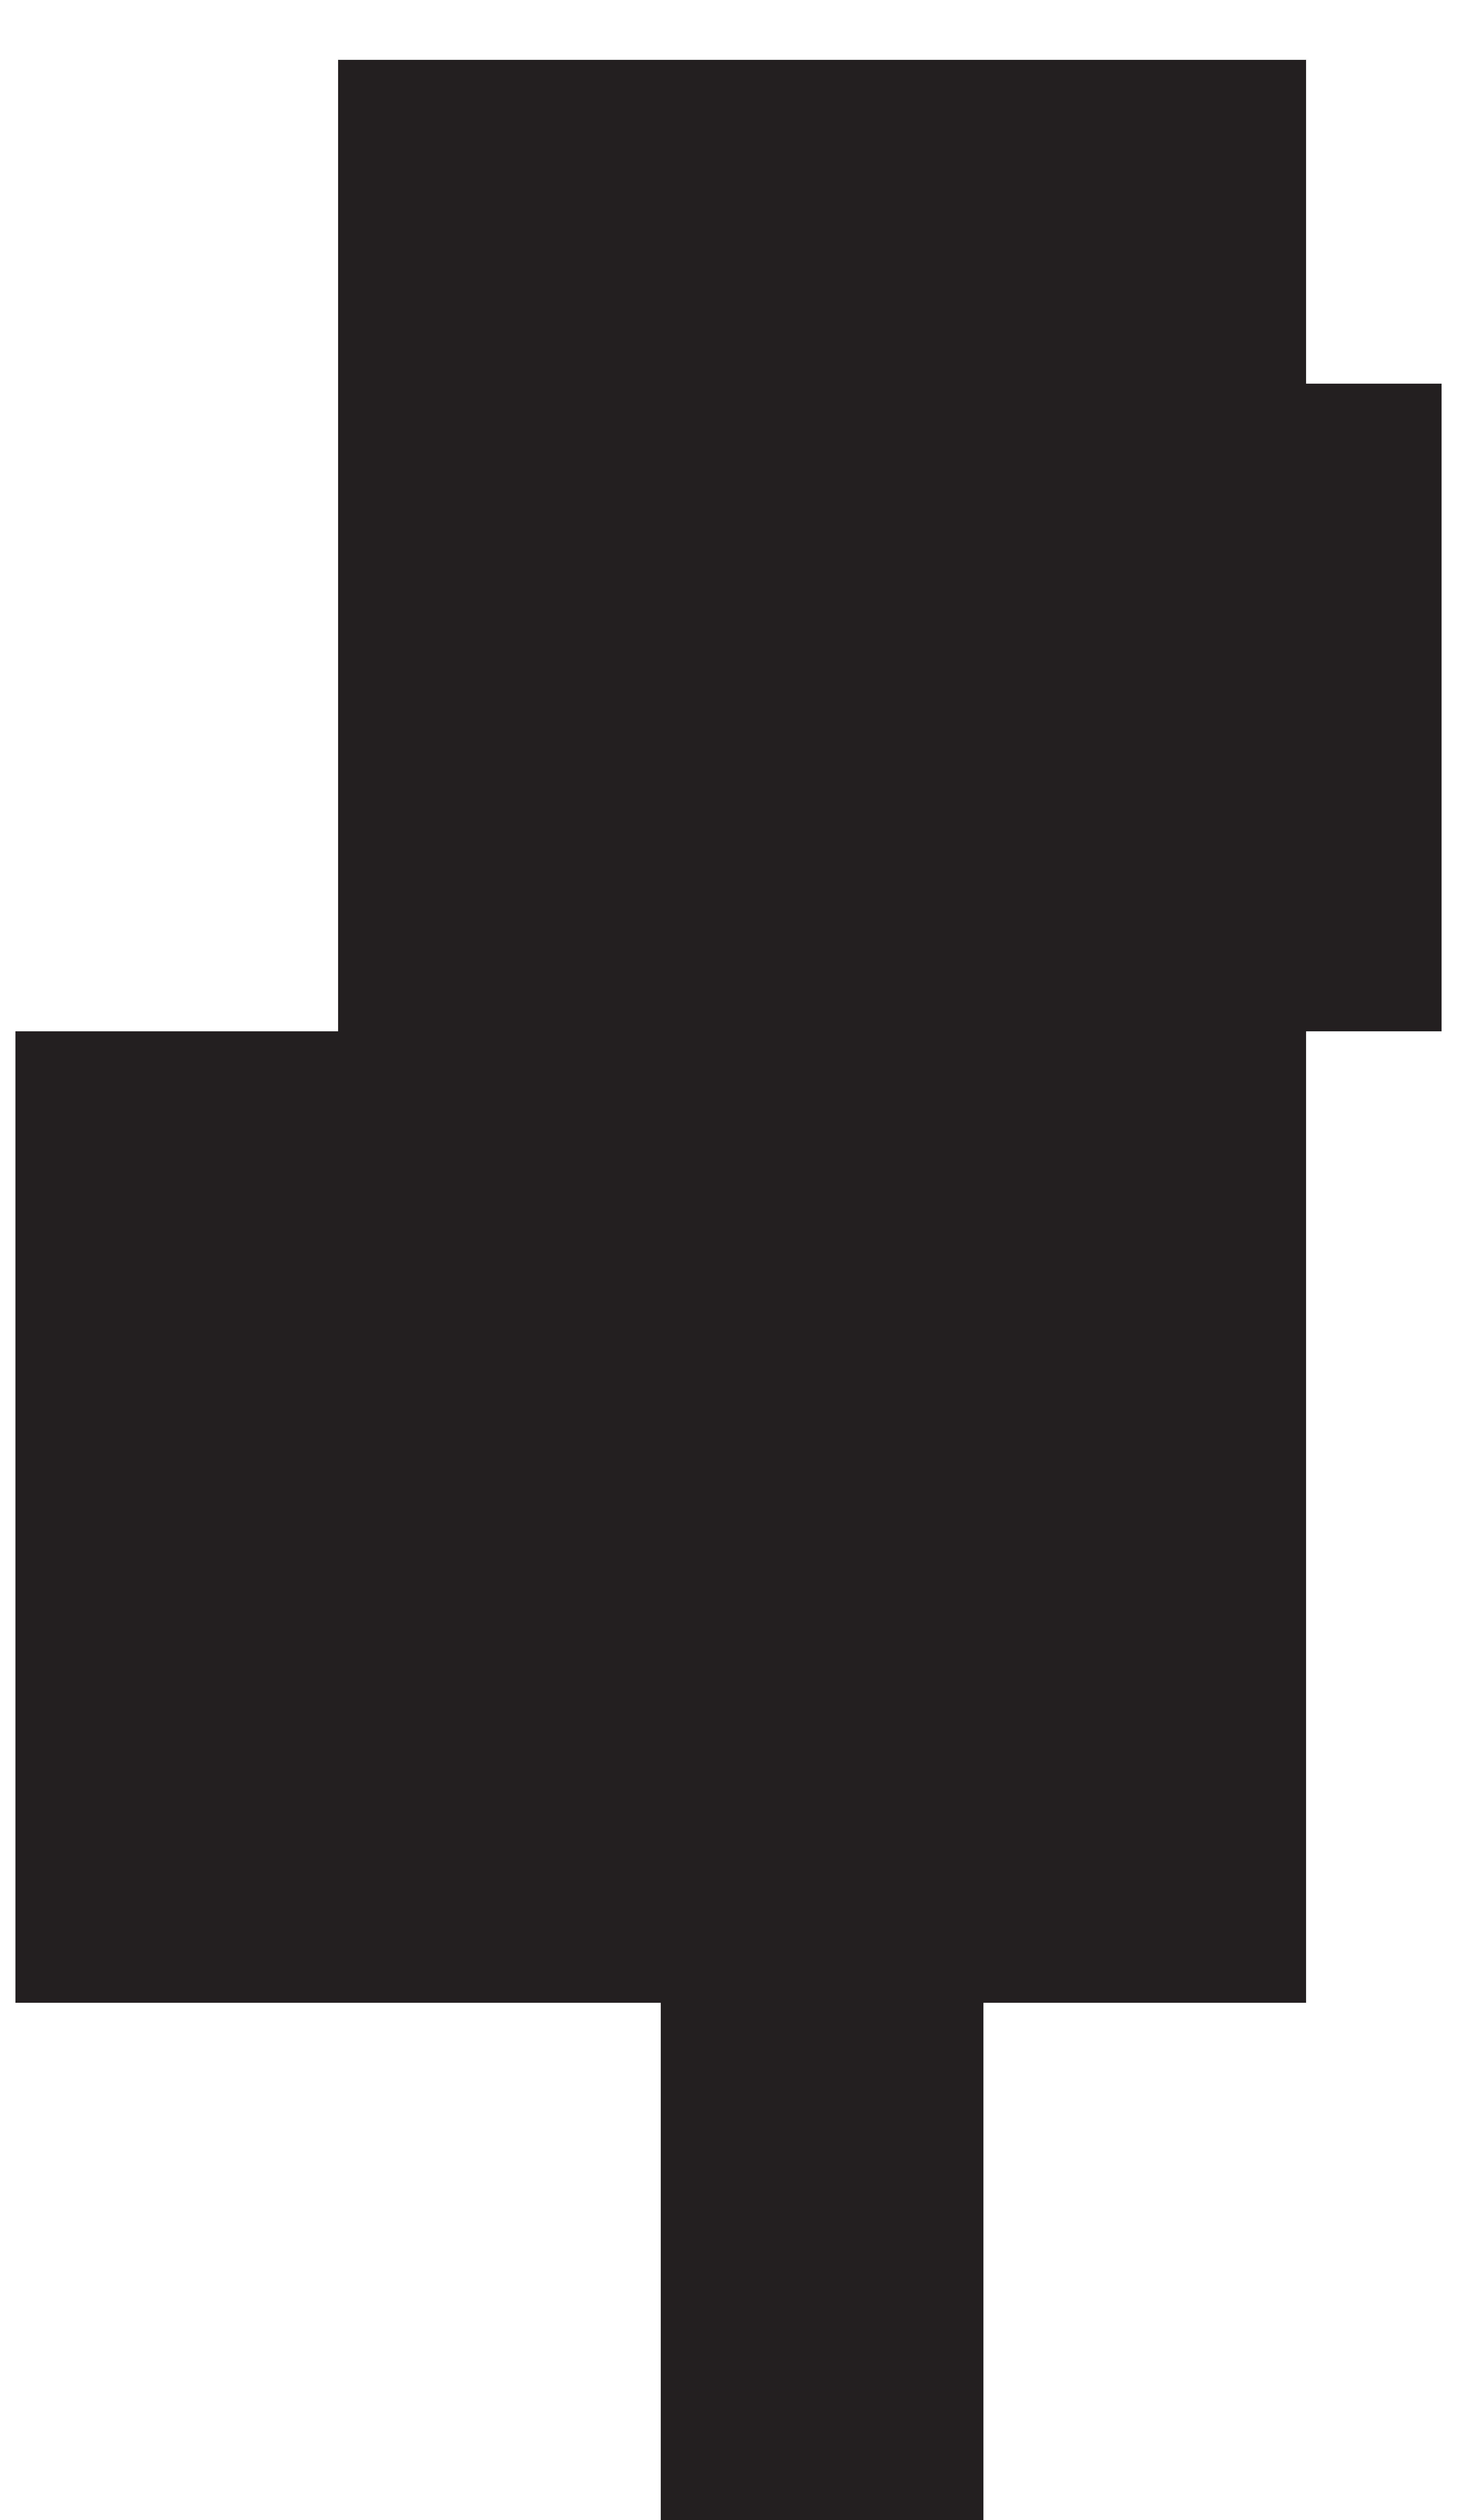 4624x8000 Rose Vine Silhouette Clip Art